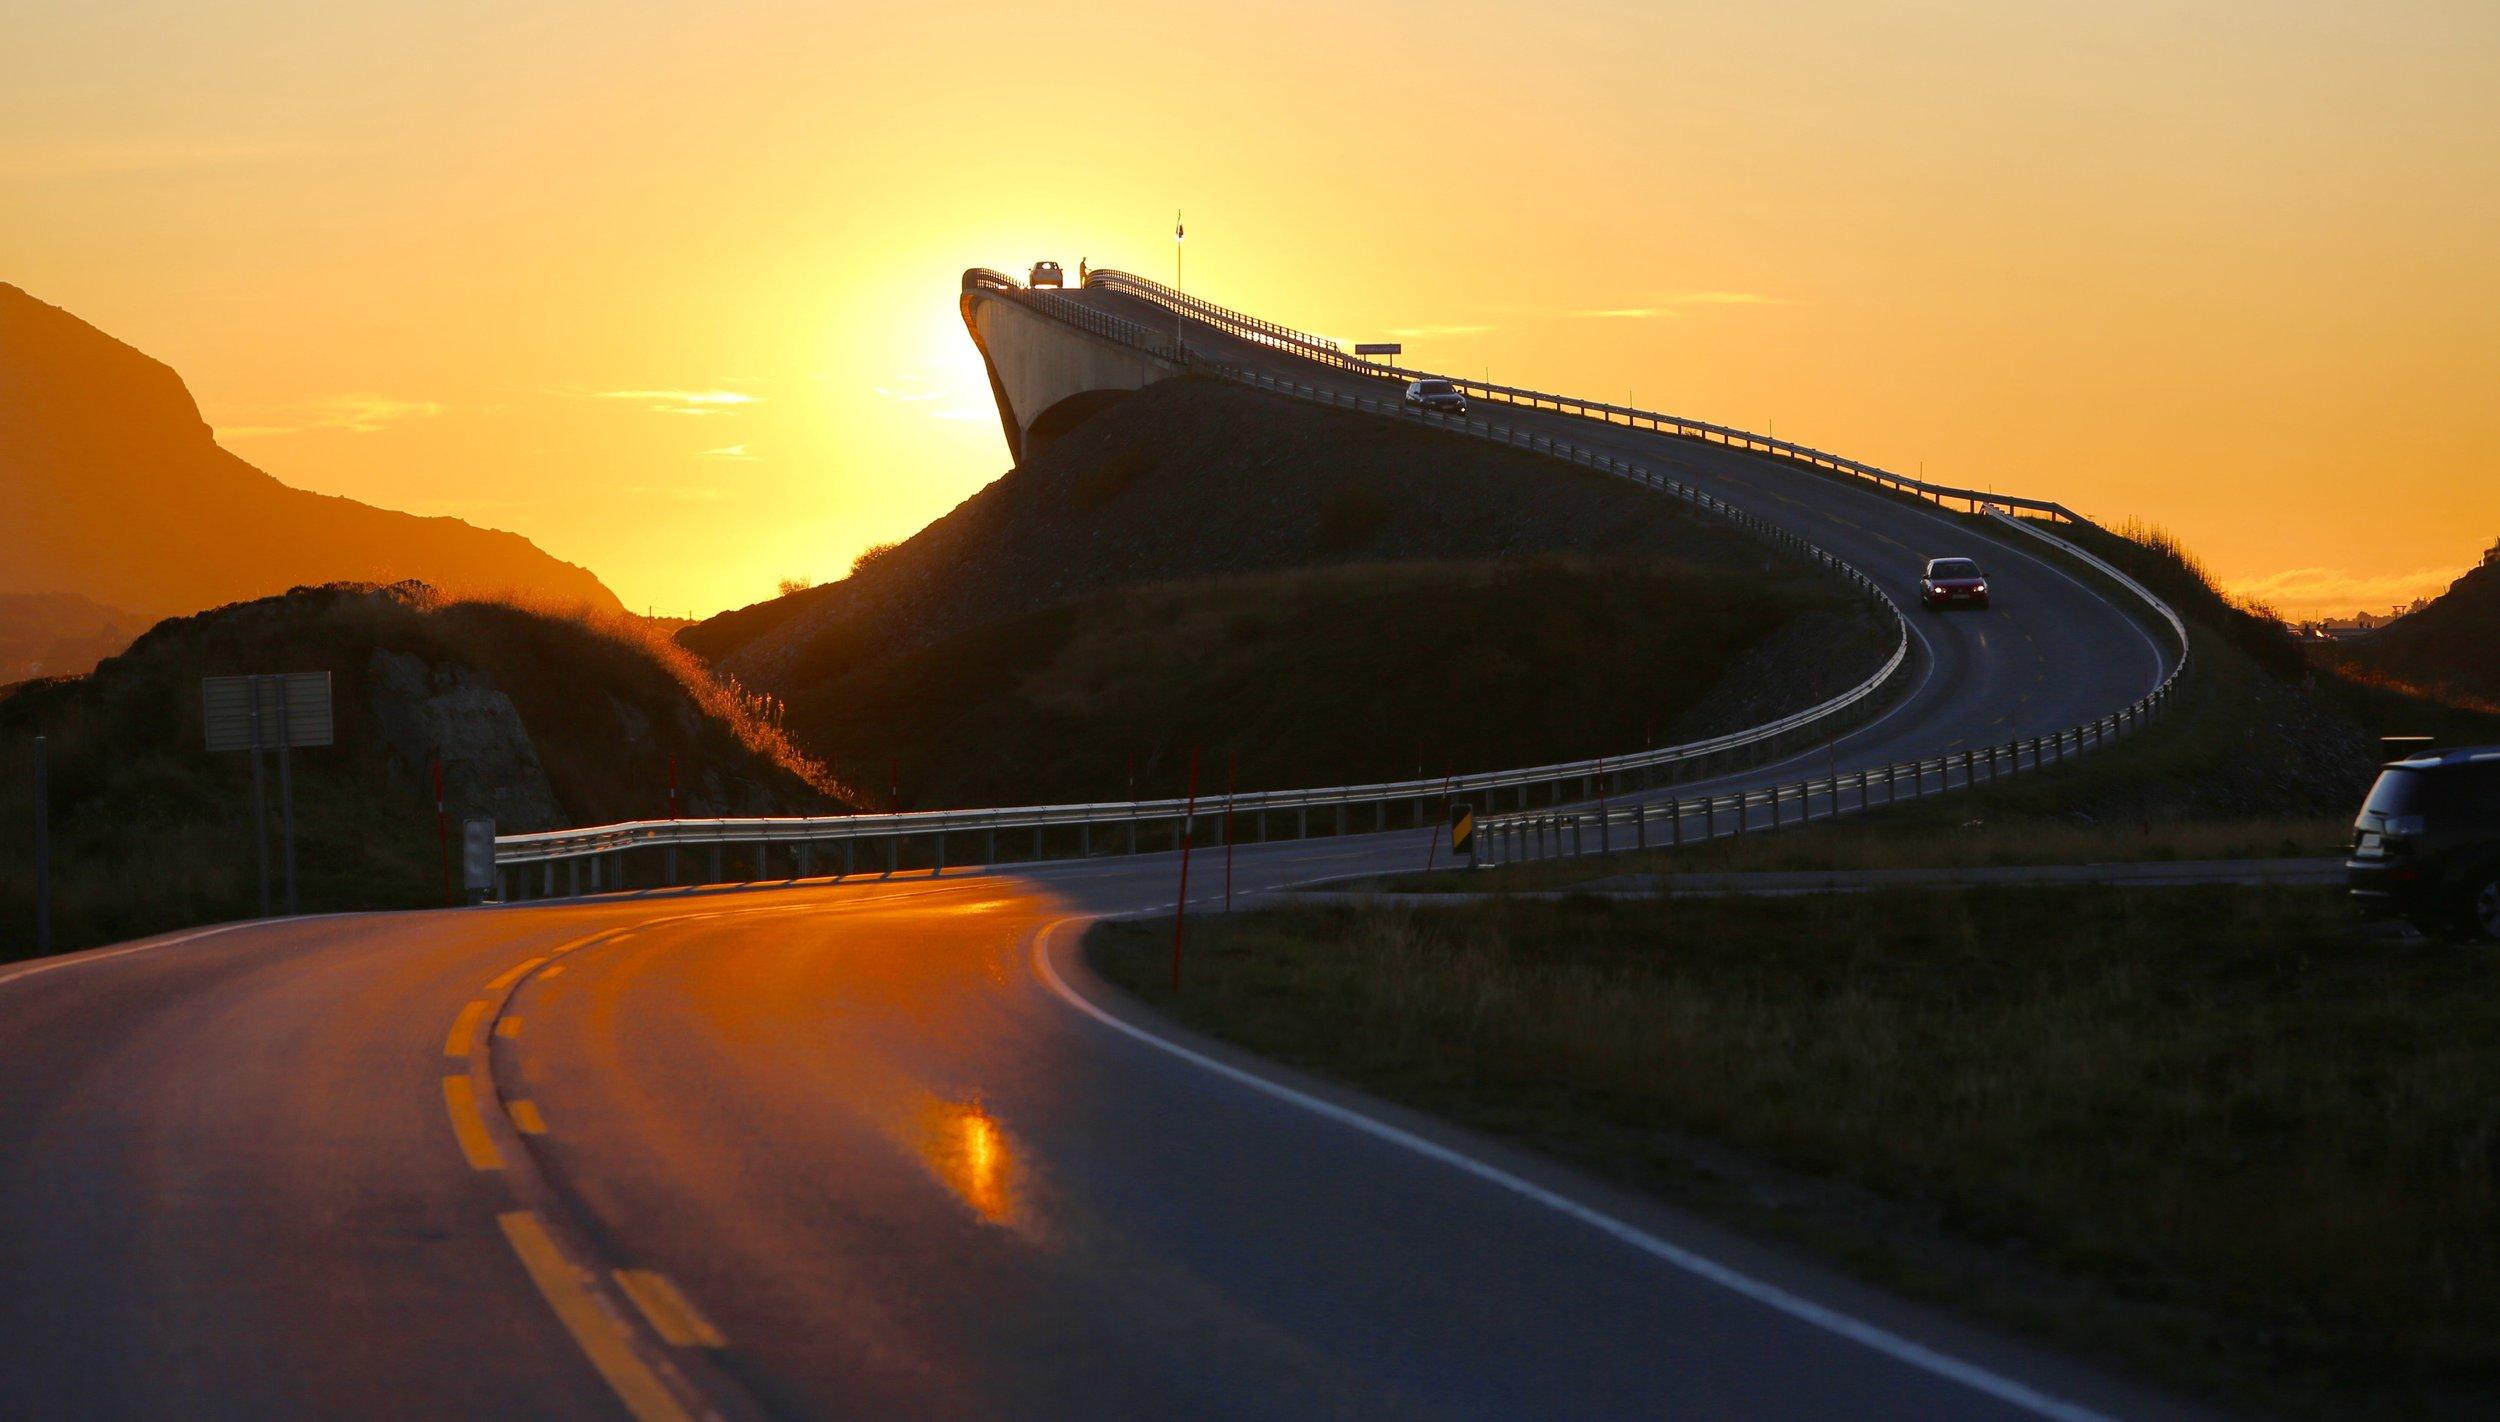 Turistveg i solnedgang.                                Foto: Odd Roar Lange